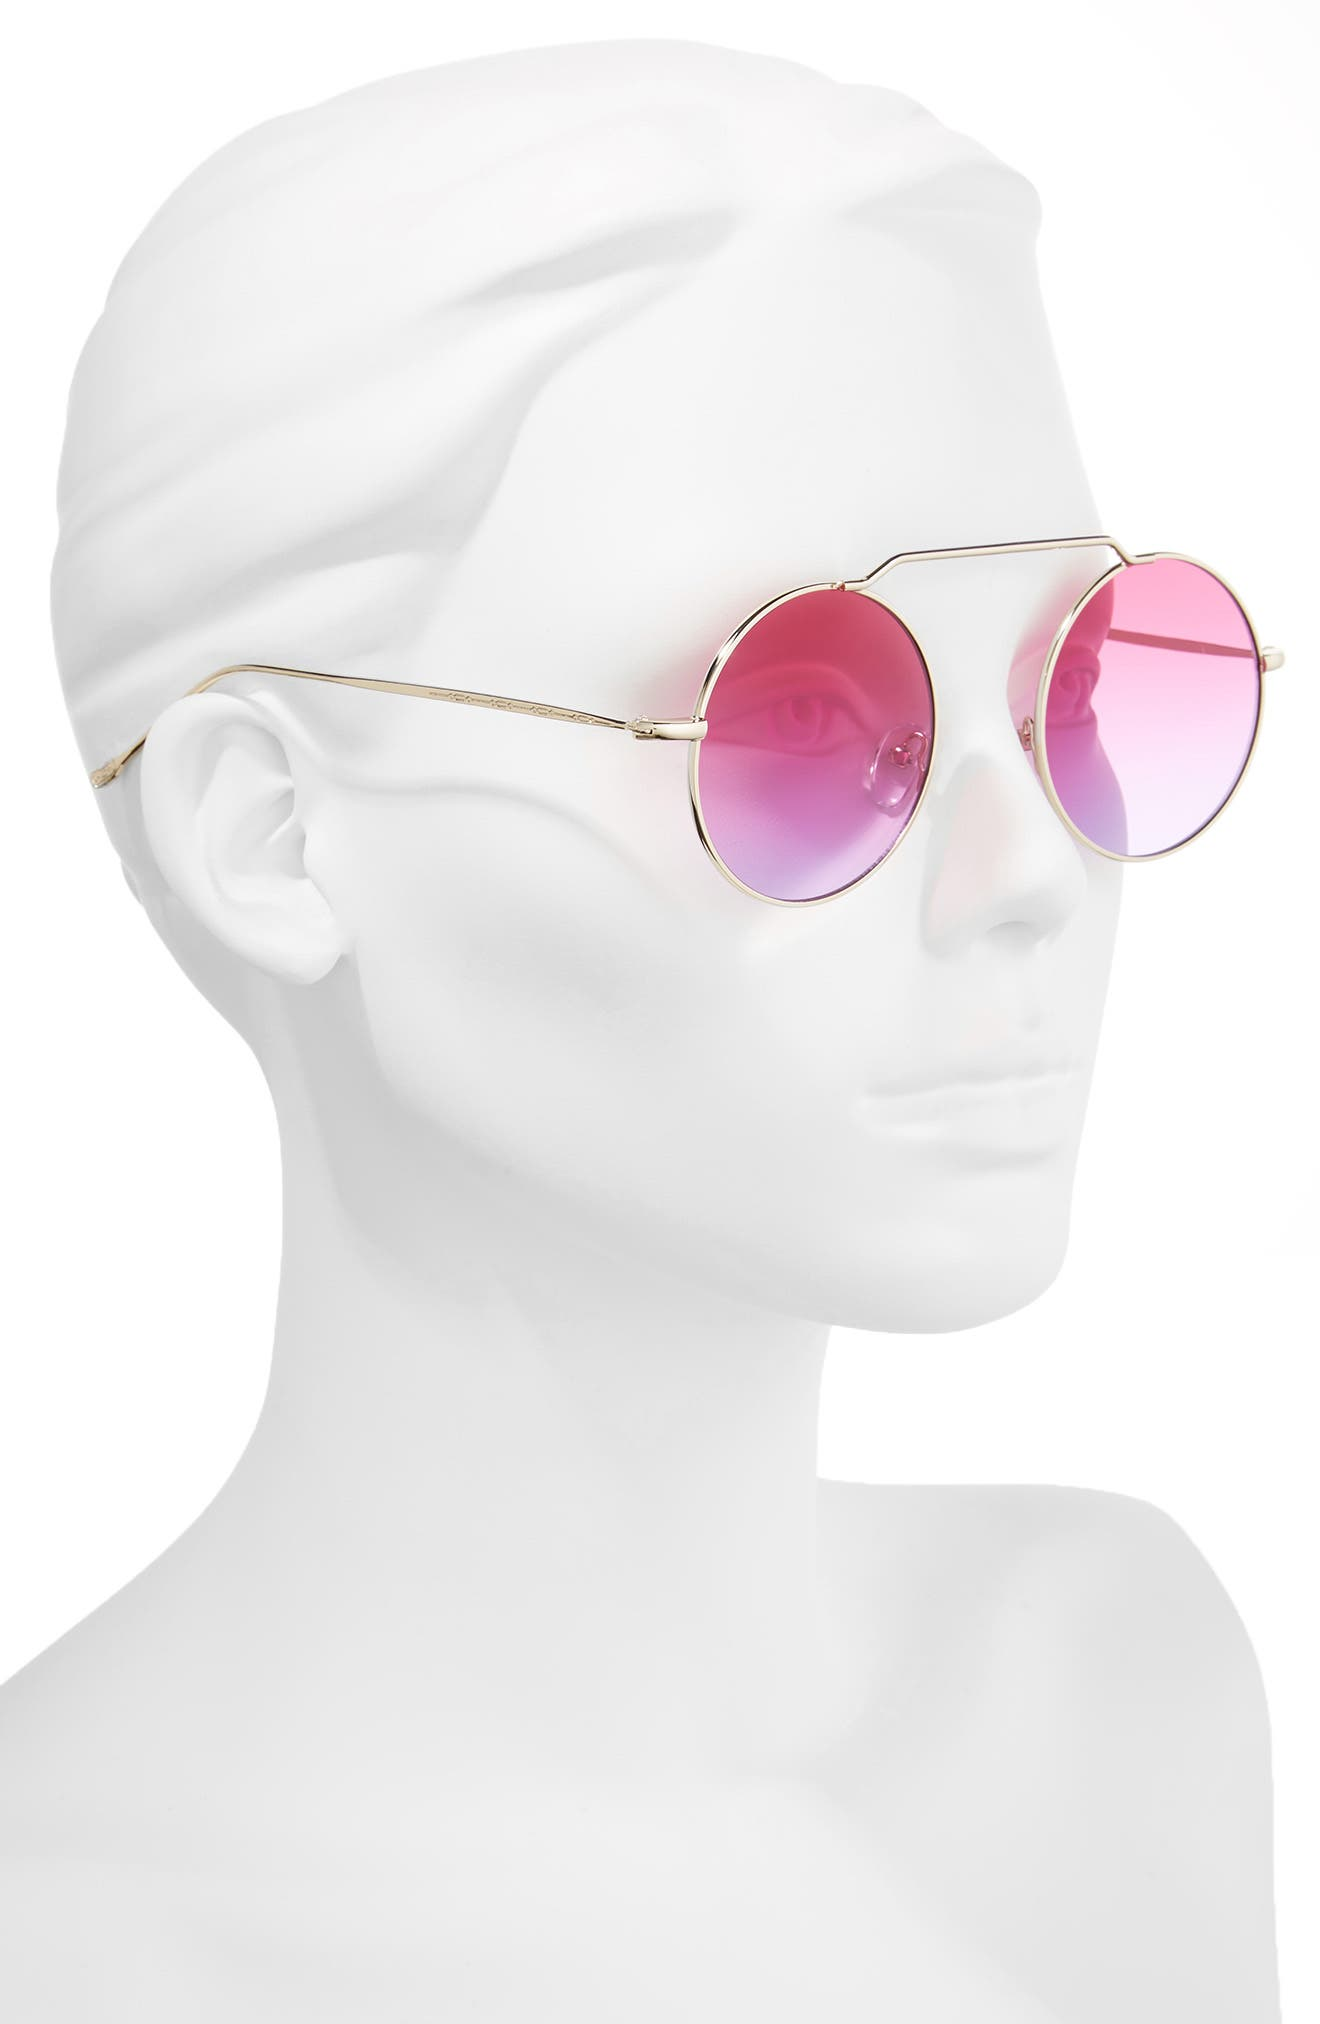 51mm Brow Bar Round Sunglasses,                             Alternate thumbnail 2, color,                             Purple